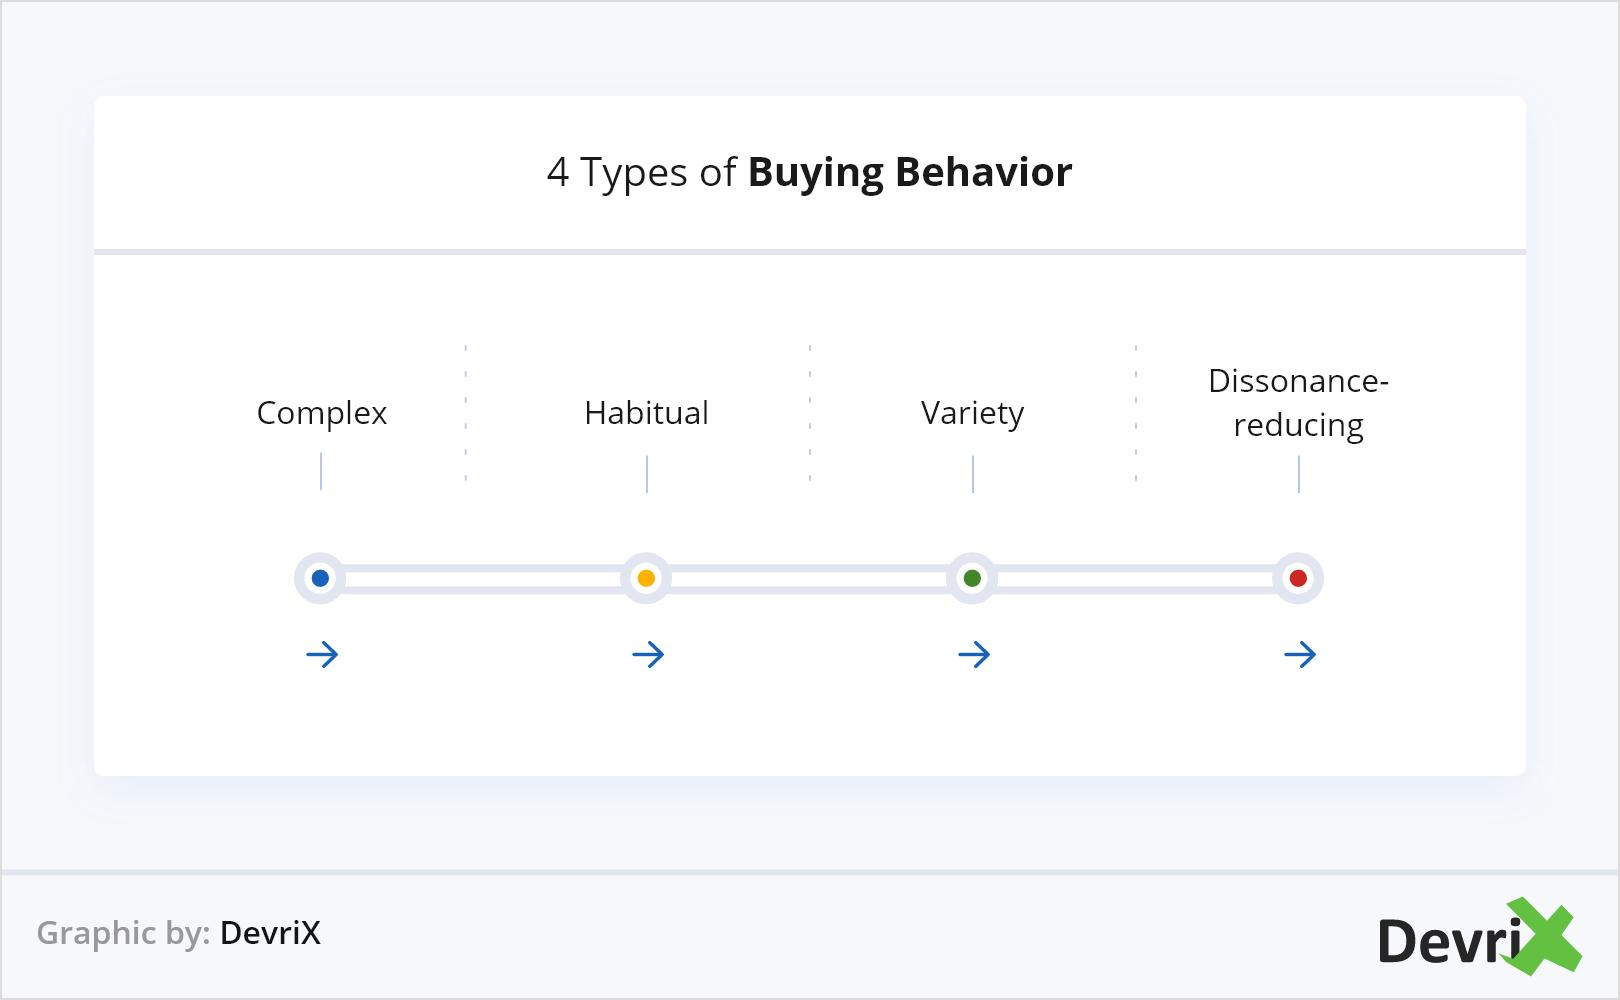 4 Types of Buying Behavior@2x